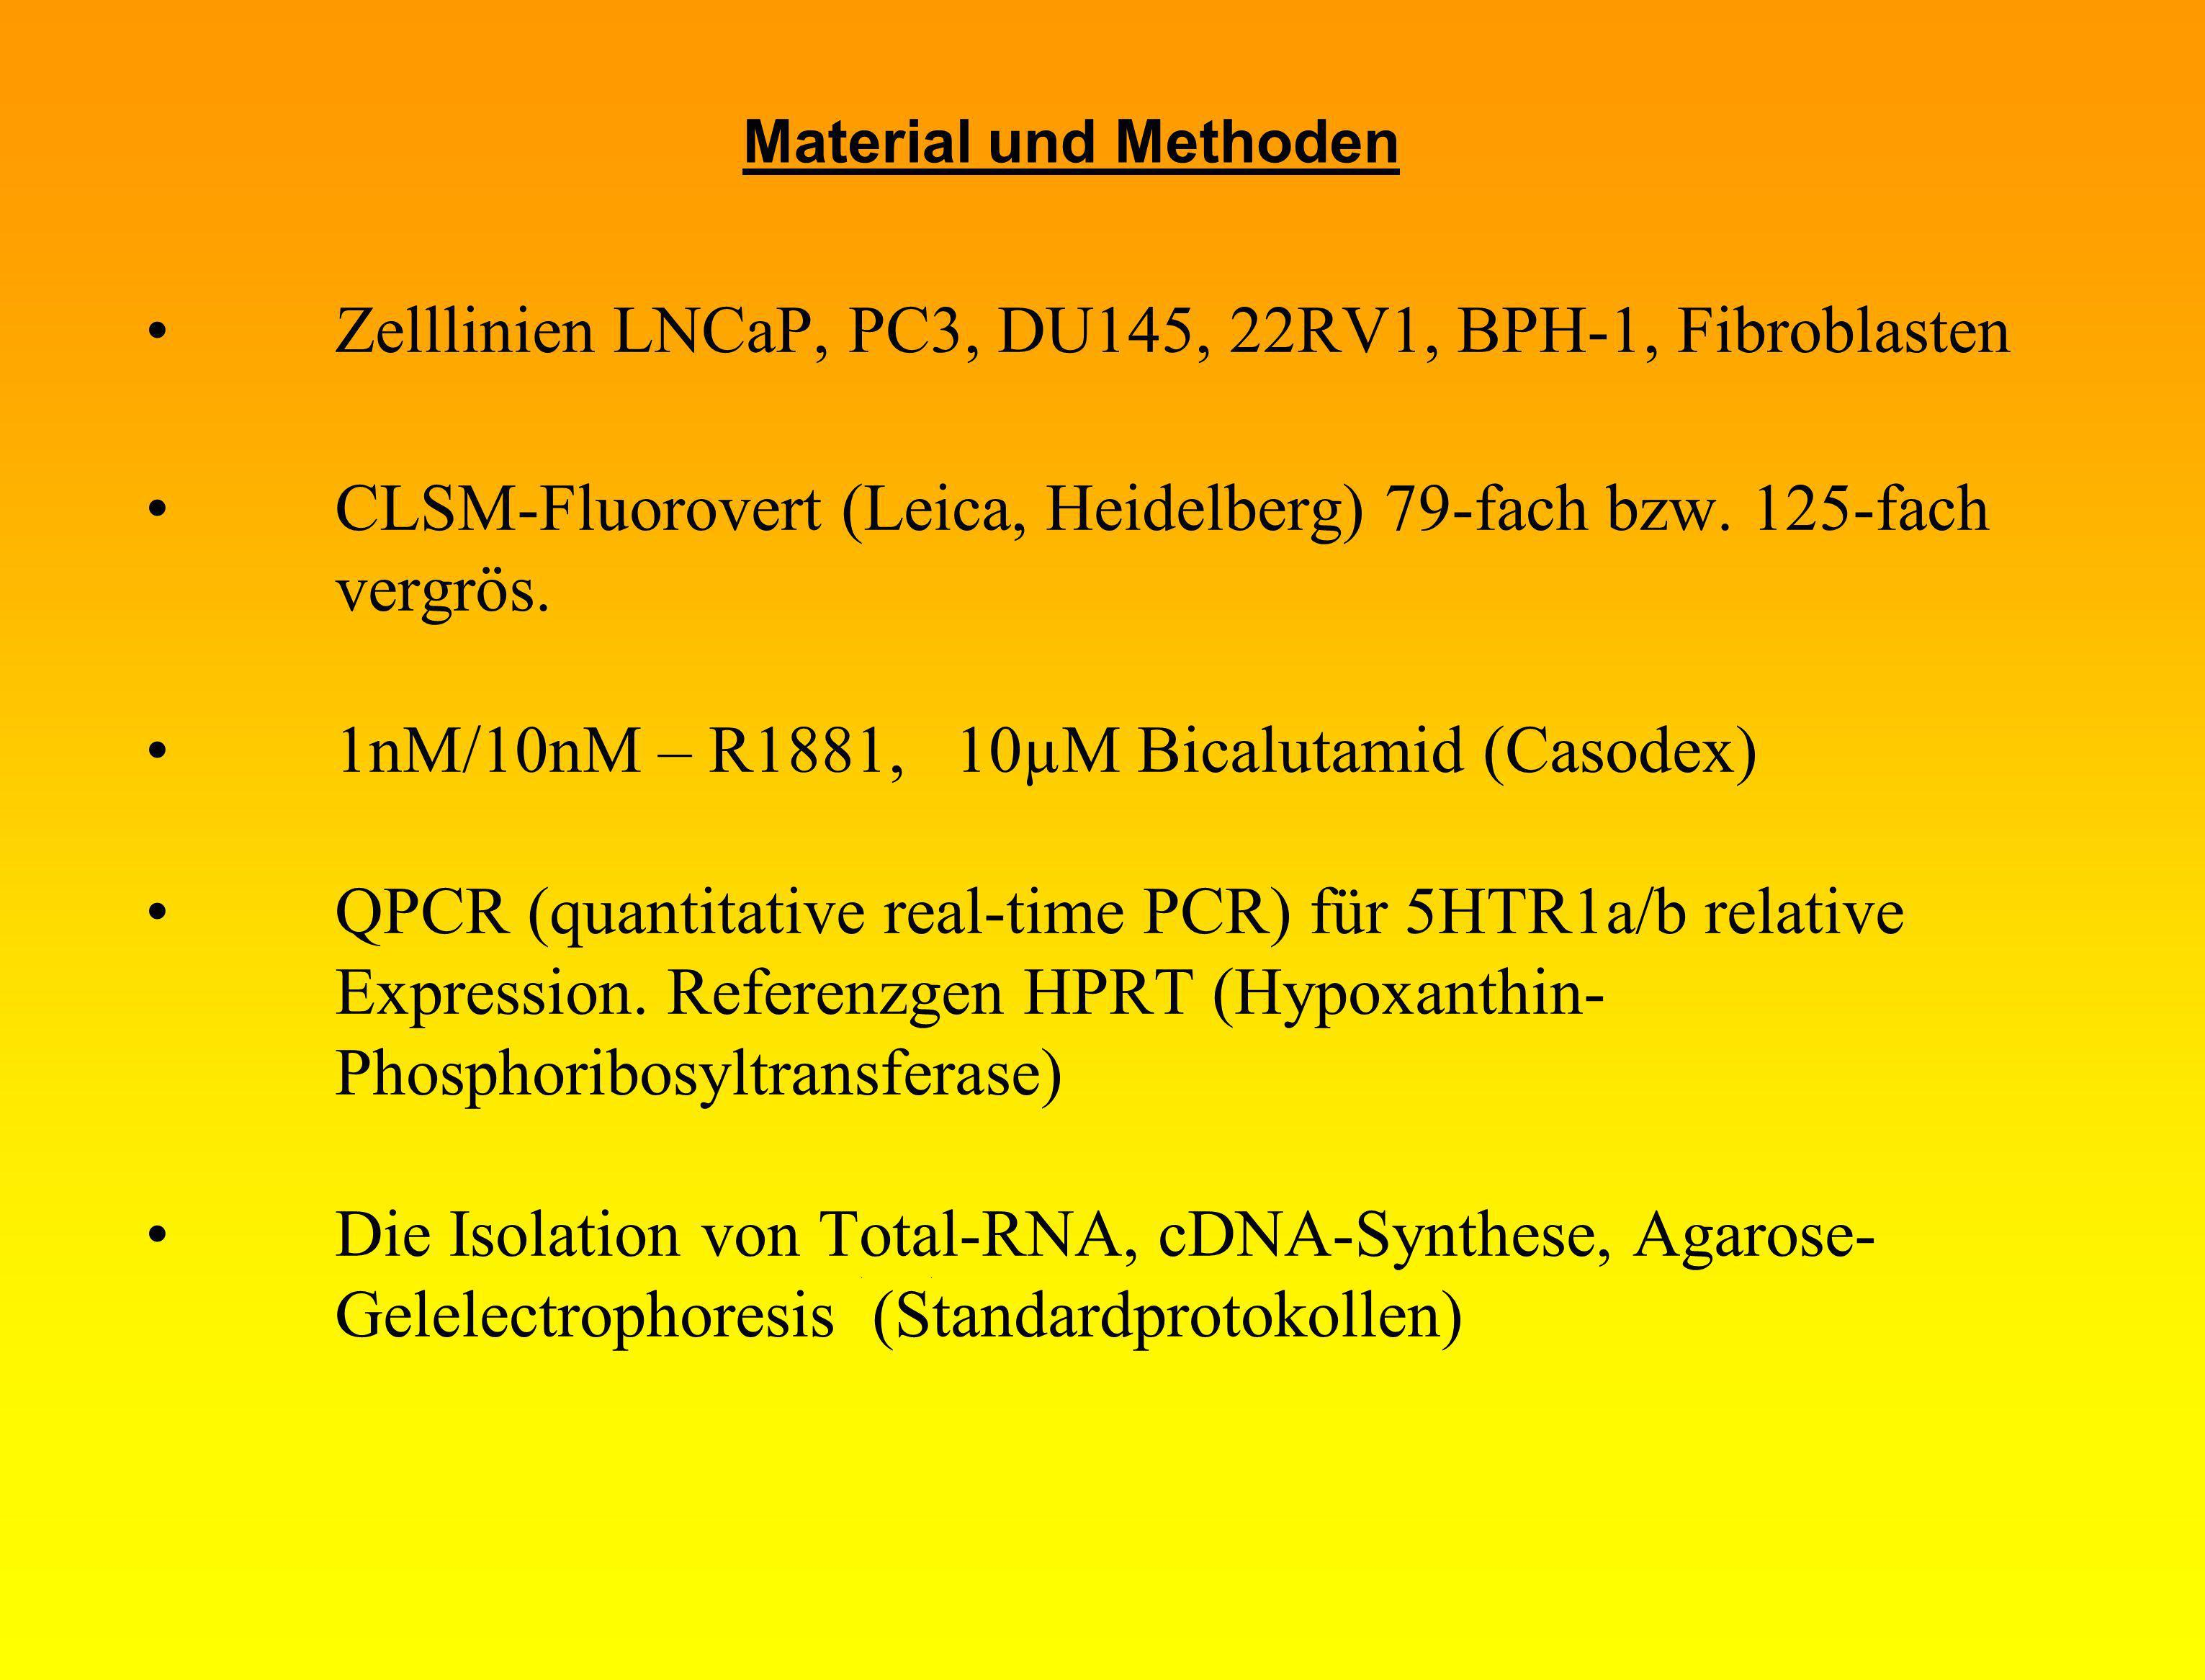 Zelllinien LNCaP, PC3, DU145, 22RV1, BPH-1, Fibroblasten